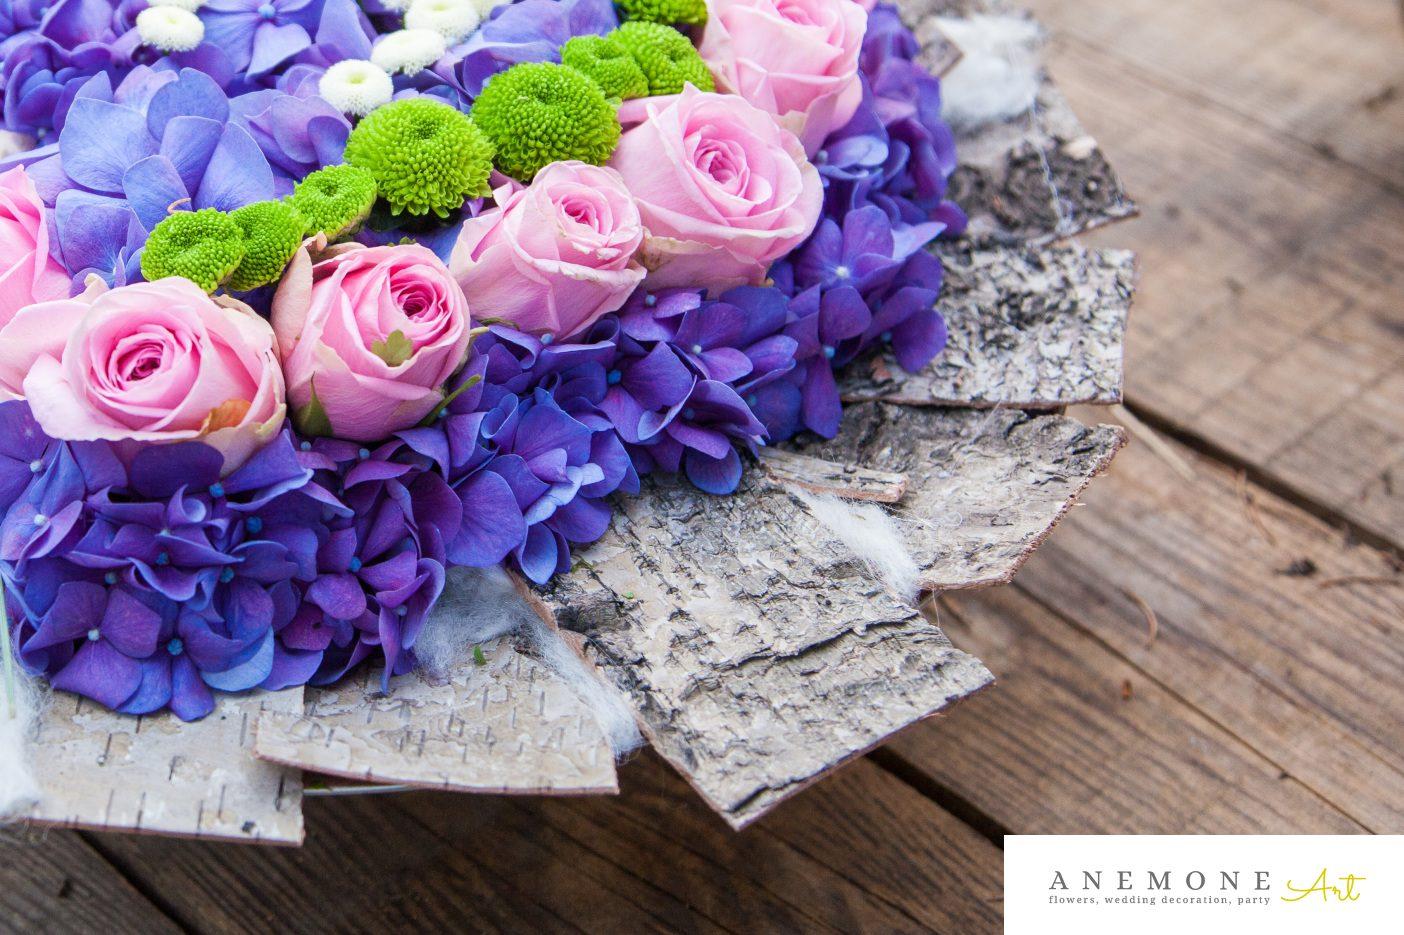 Poza, foto cu Flori de nunta aniversare, decor tematic, detaliu, hortensia, inima, trandafiri in Arad, Timisoara, Oradea (wedding flowers, bouquets) nunta Arad, Timisoara, Oradea